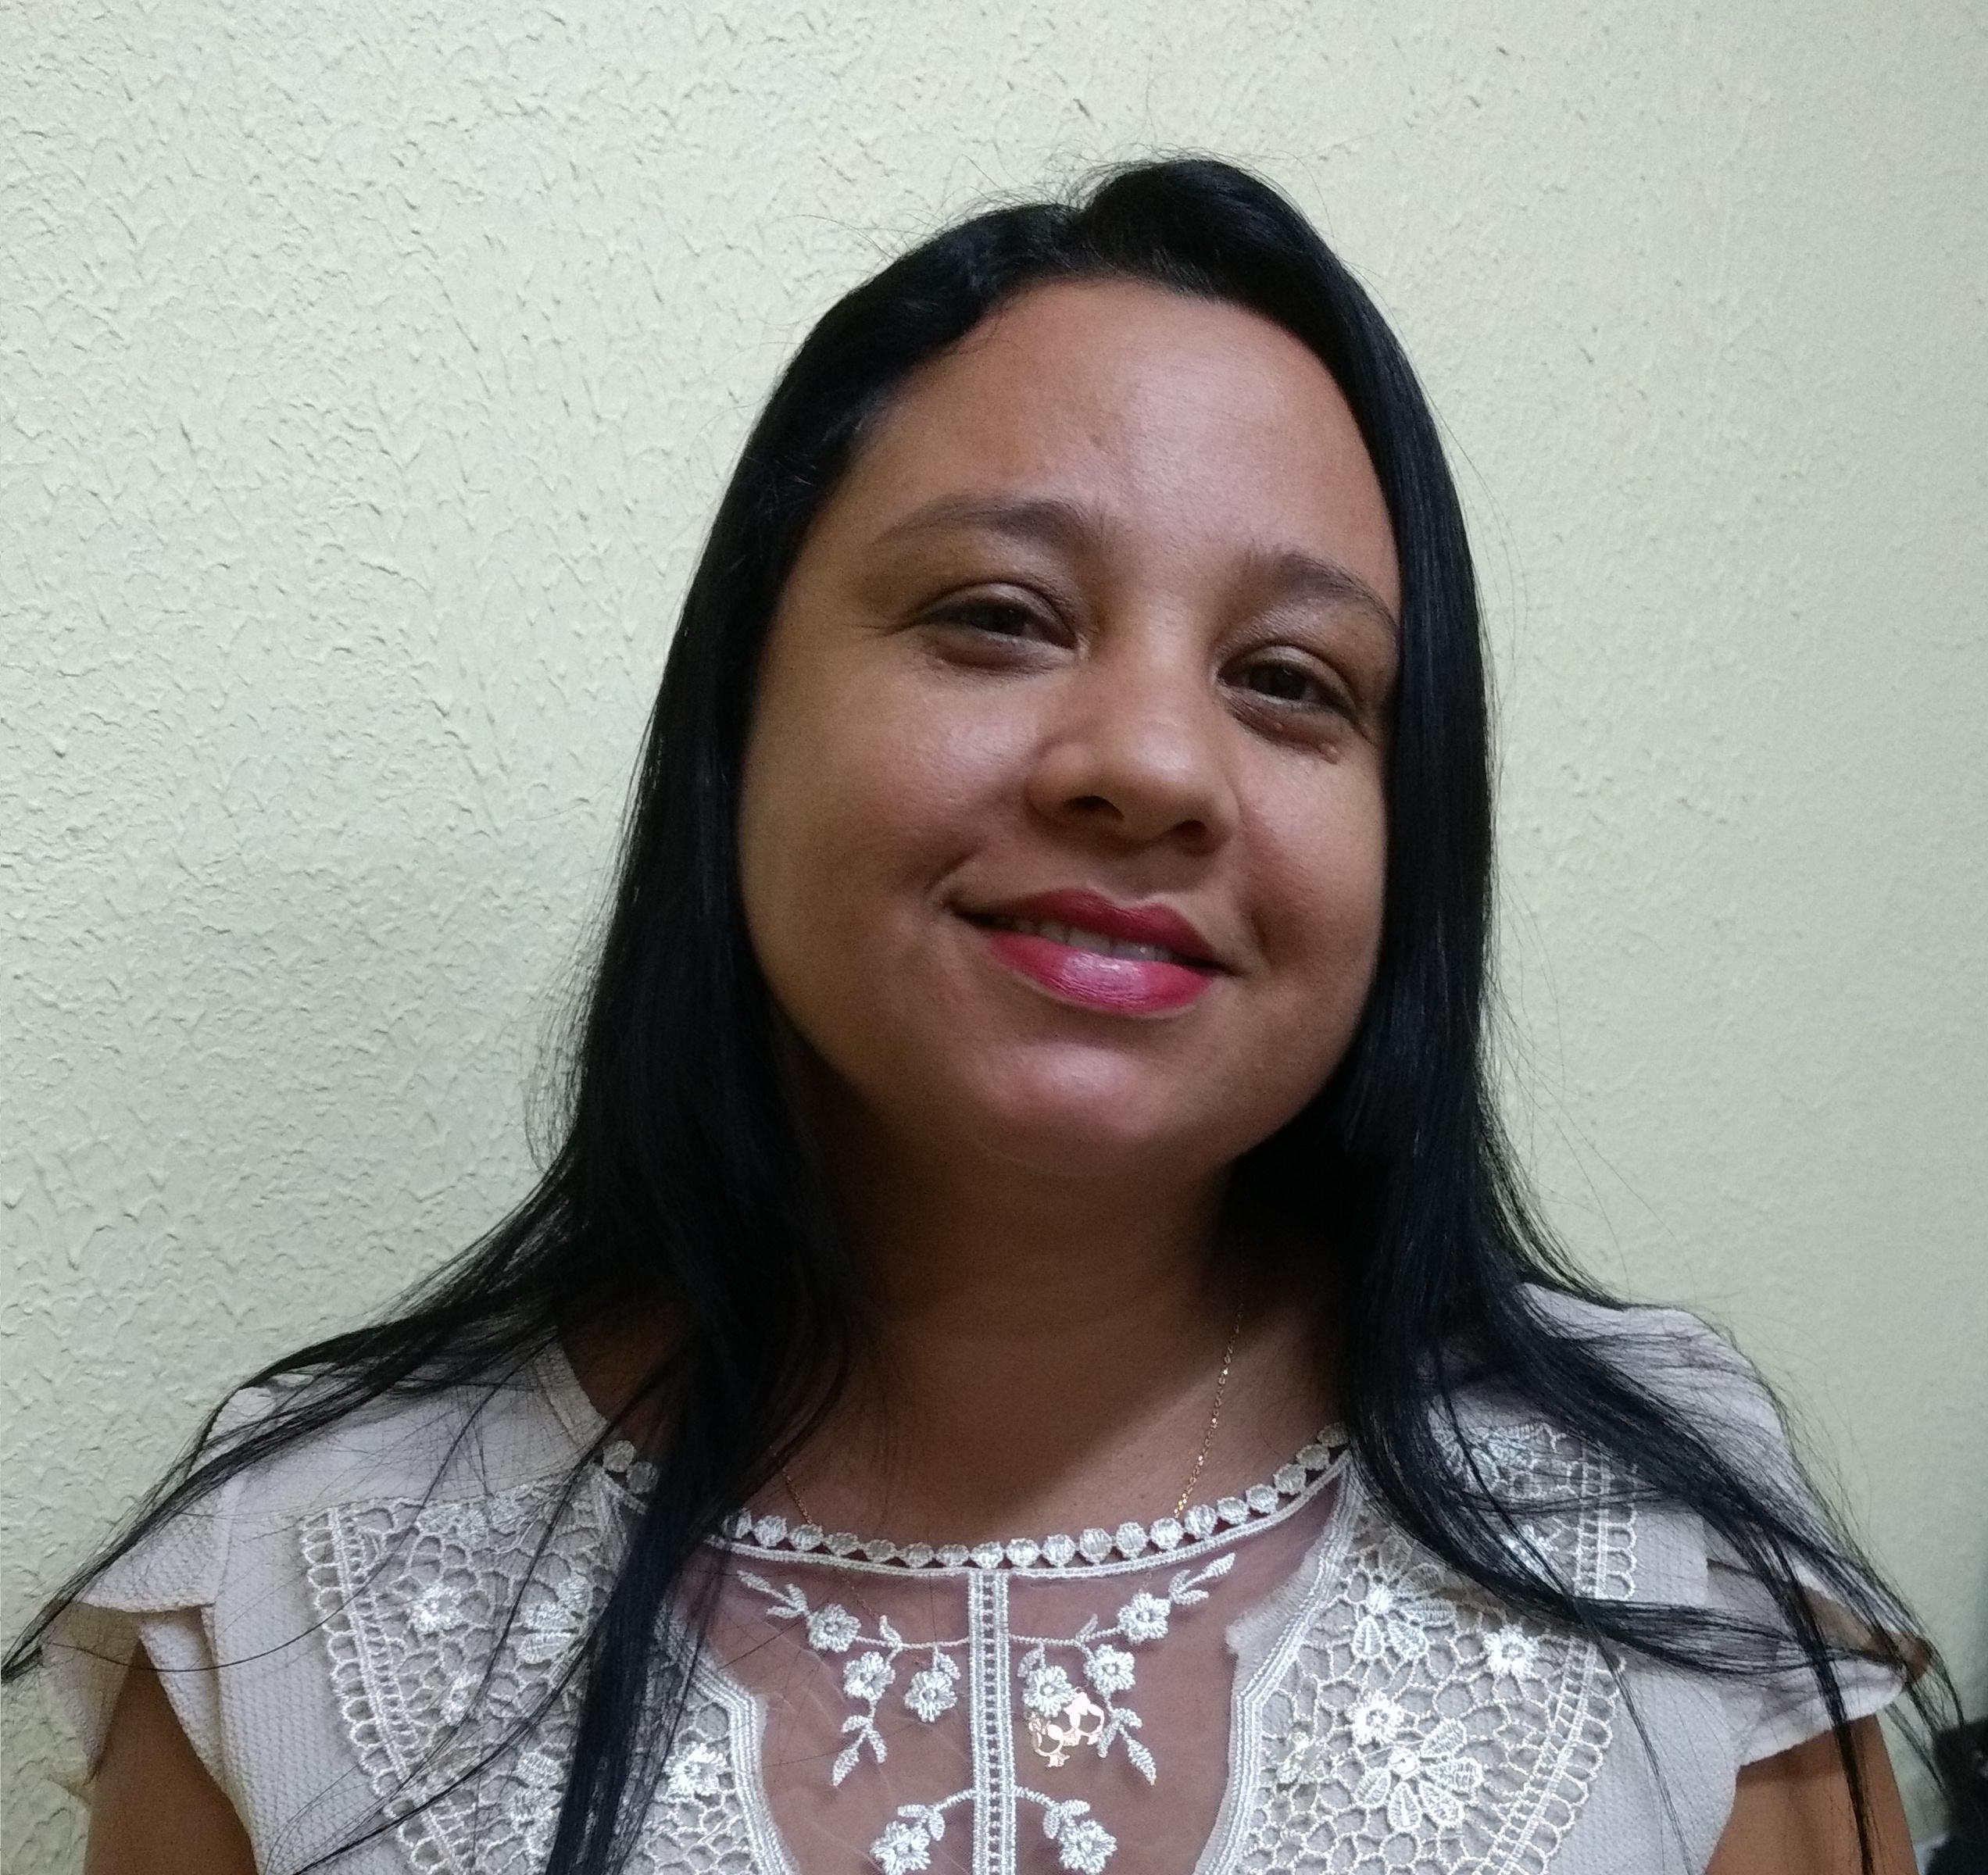 Maria de Jesus Martins